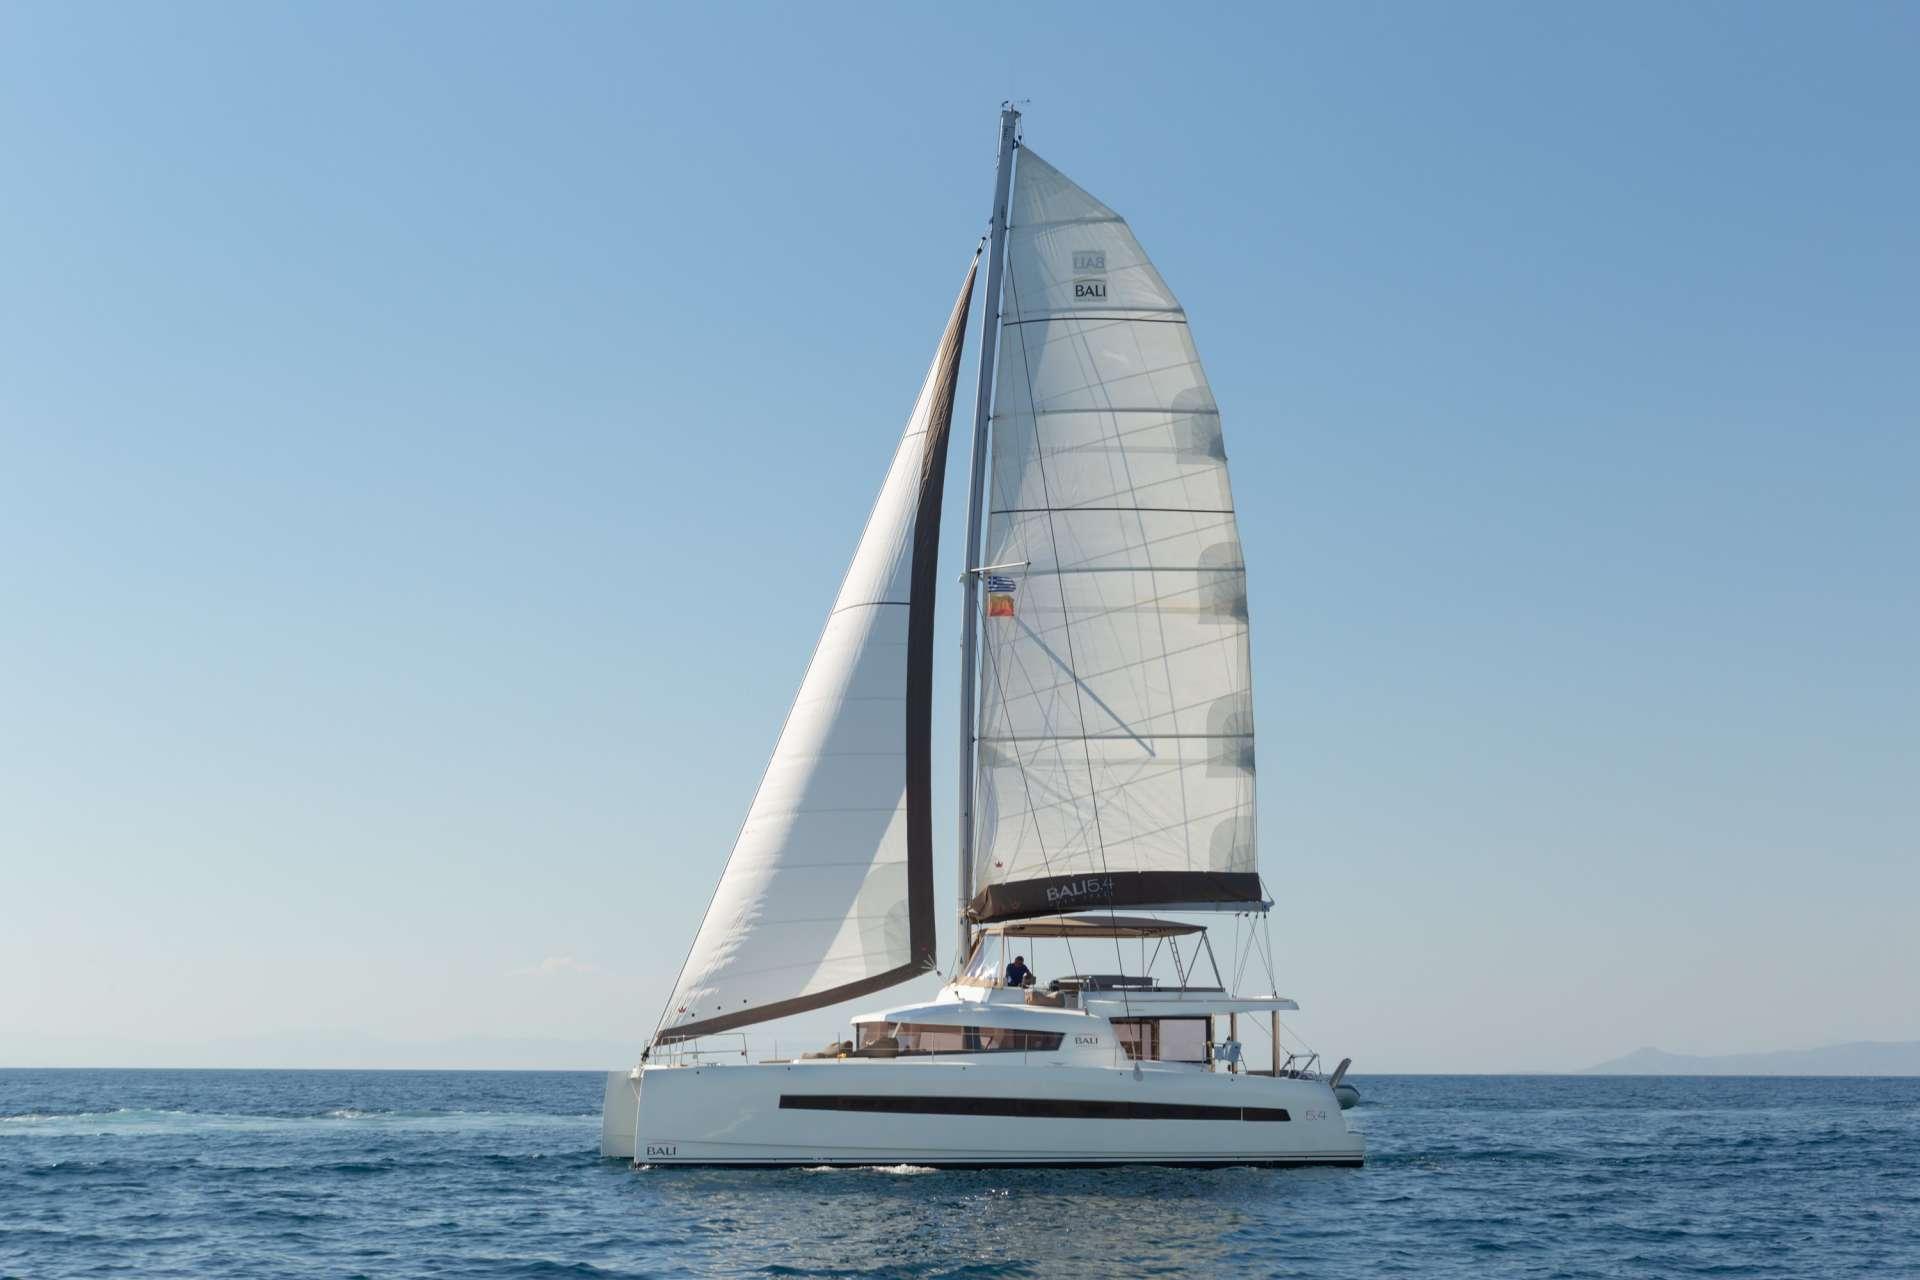 S/Y Bali 55 Fly, Luxury Crewed Catamaran